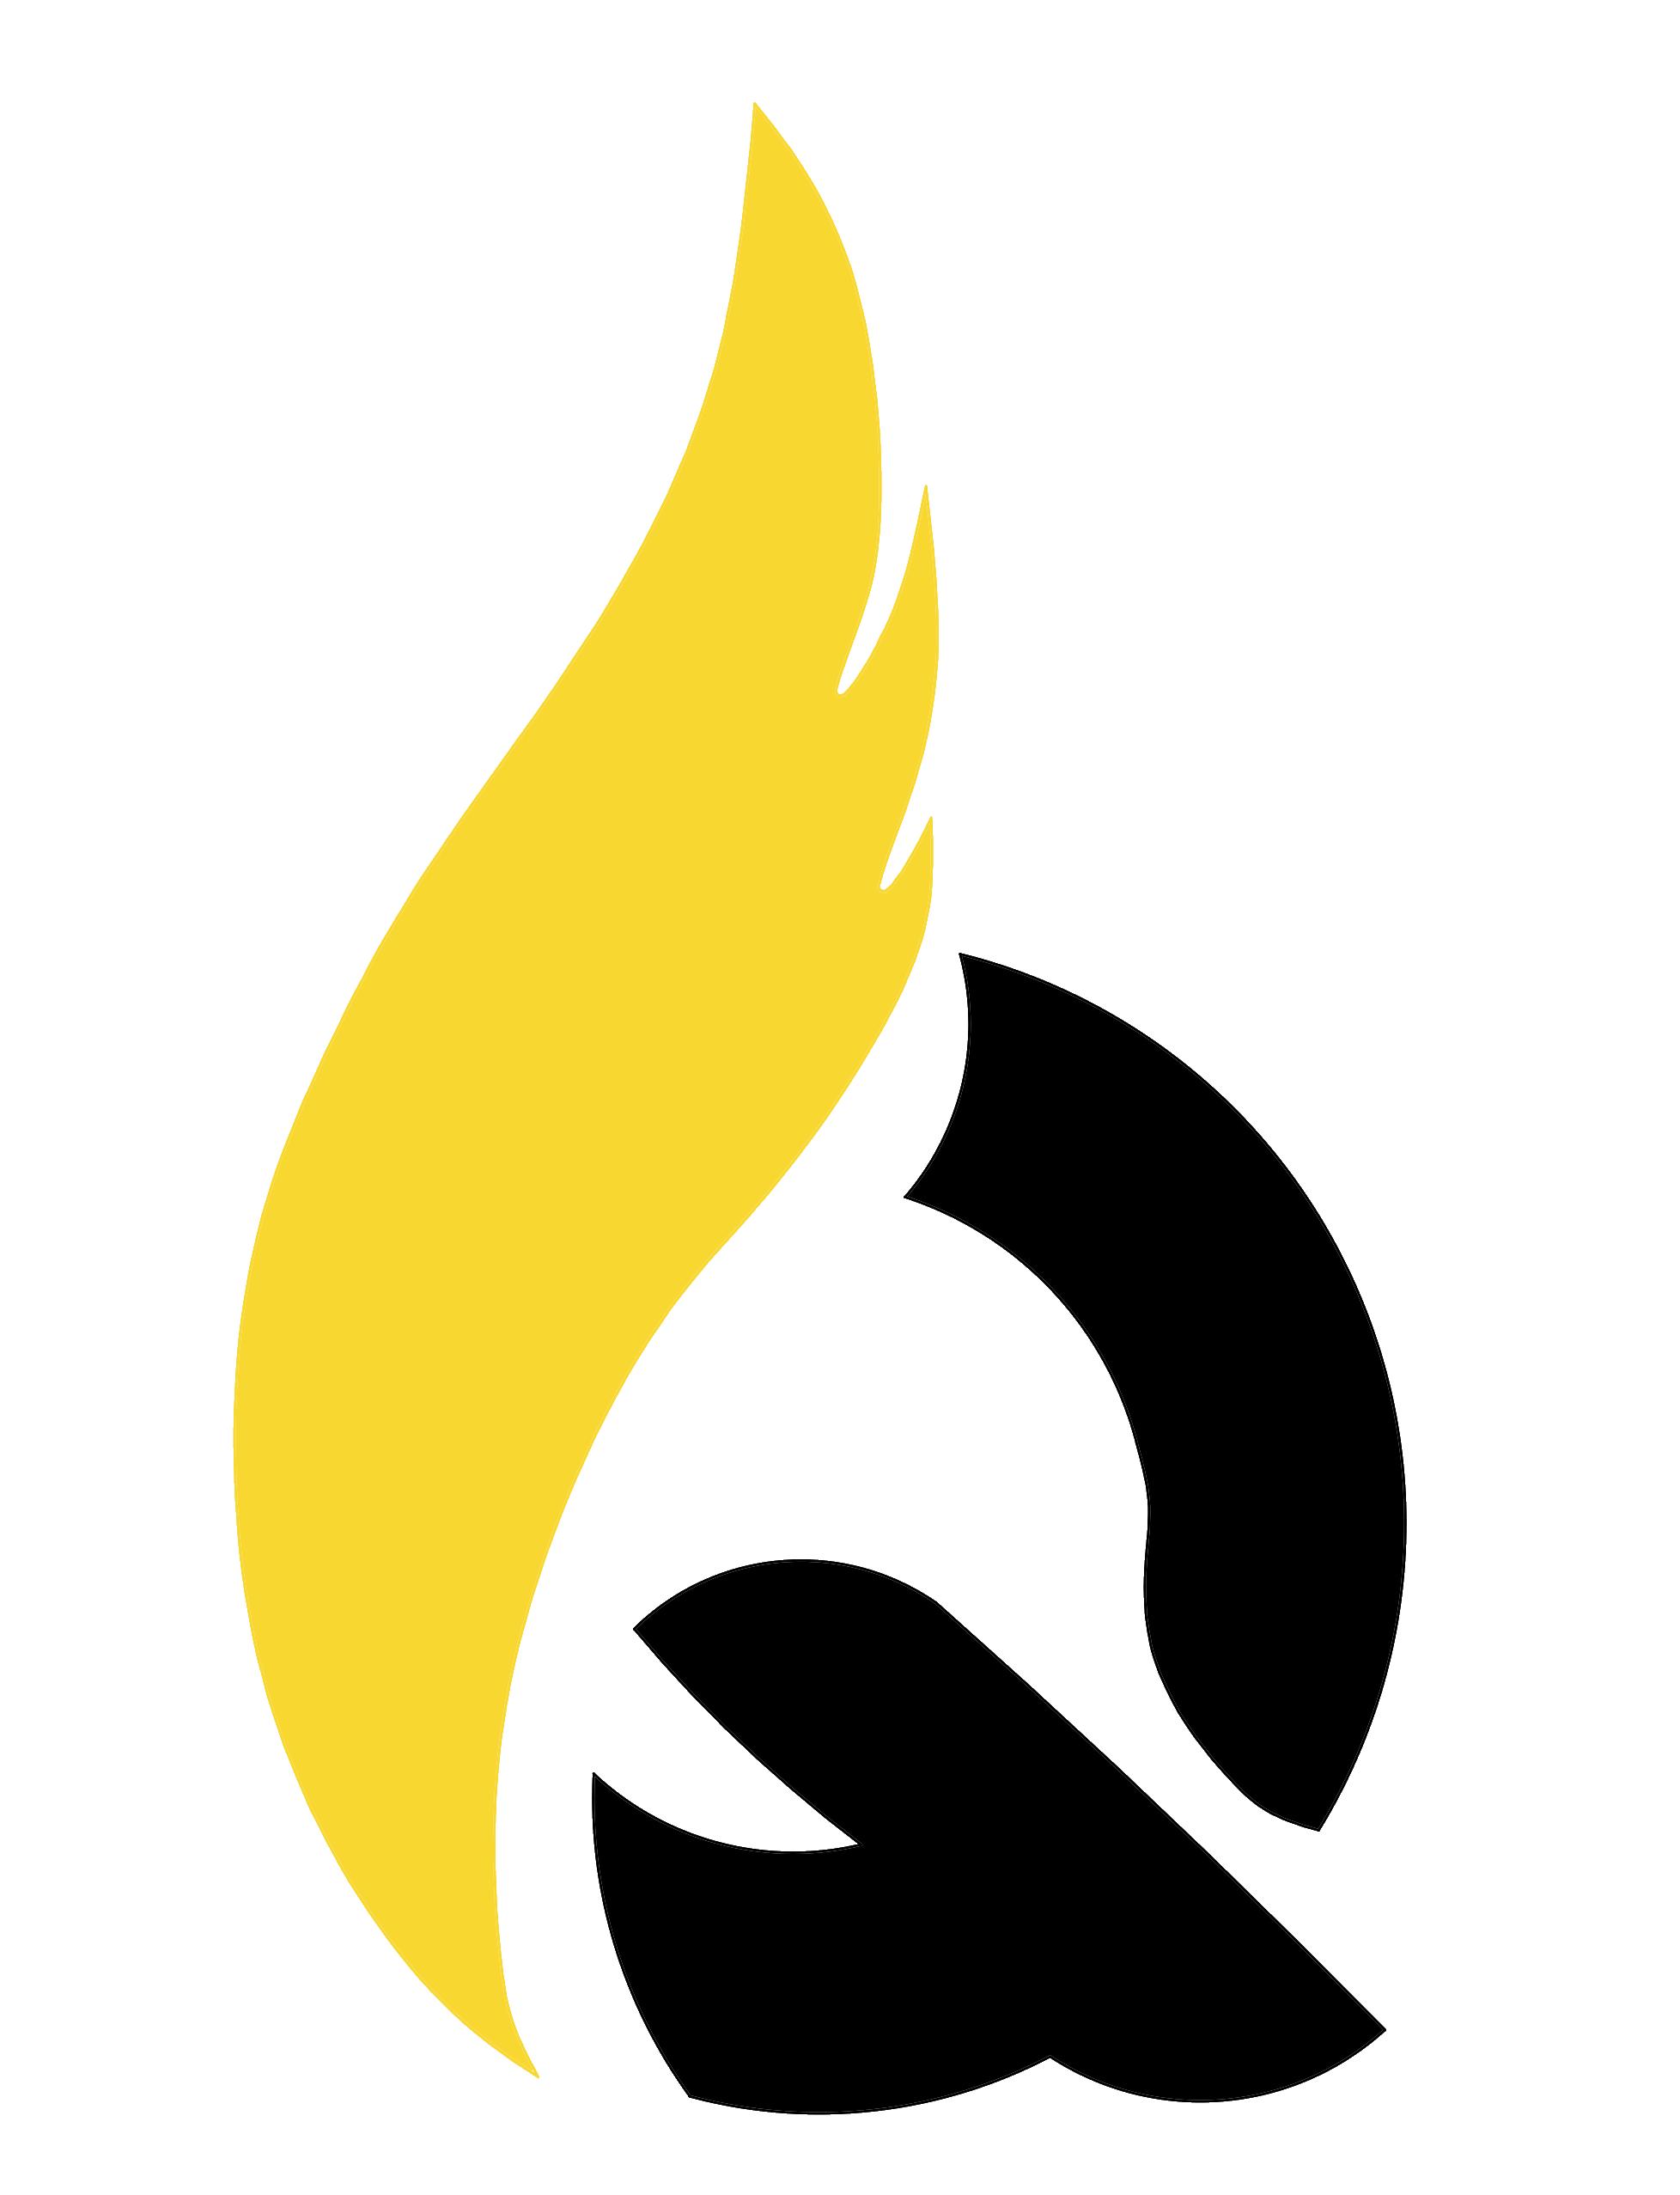 bpttq-logo-02